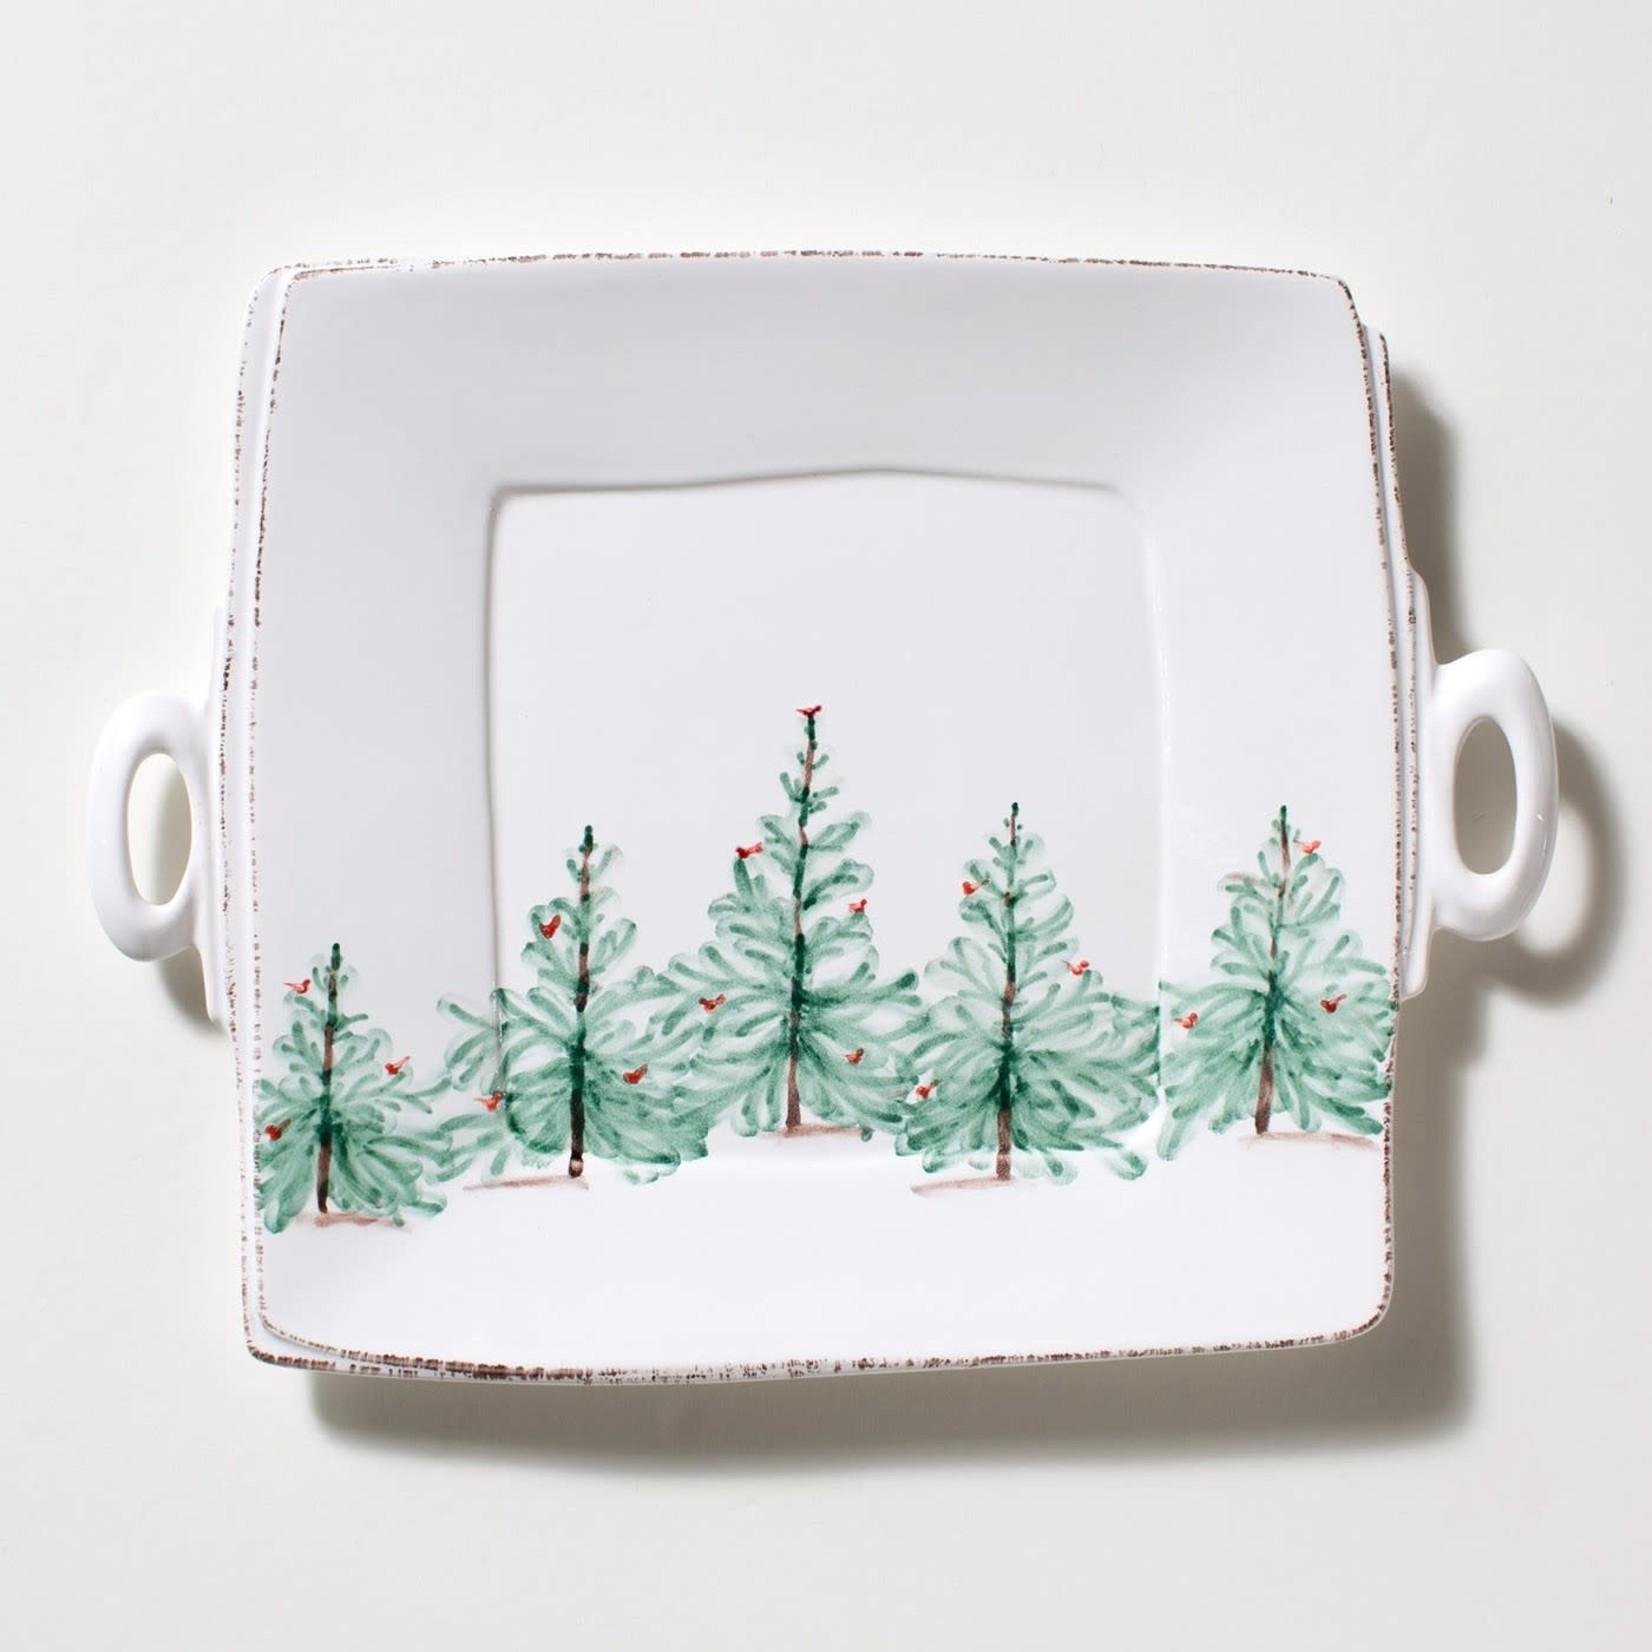 Lastra Holiday Square Platter Handled